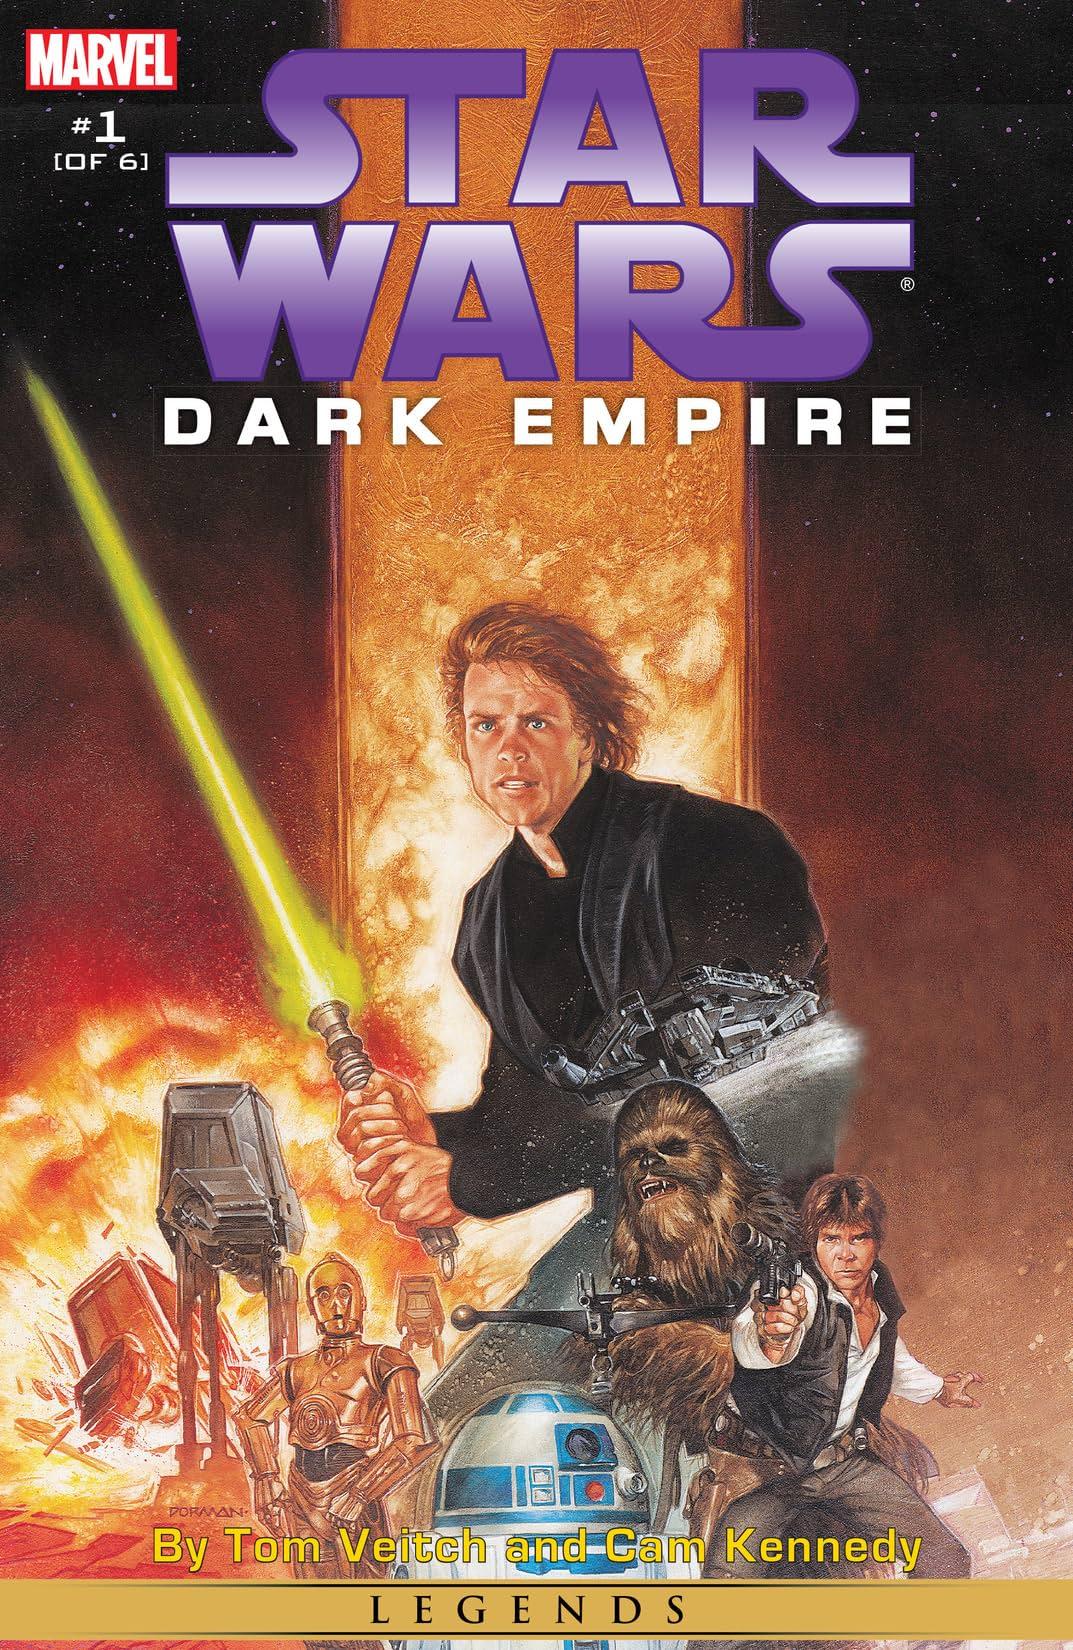 Star Wars: Dark Empire (1991) #1 (of 6)